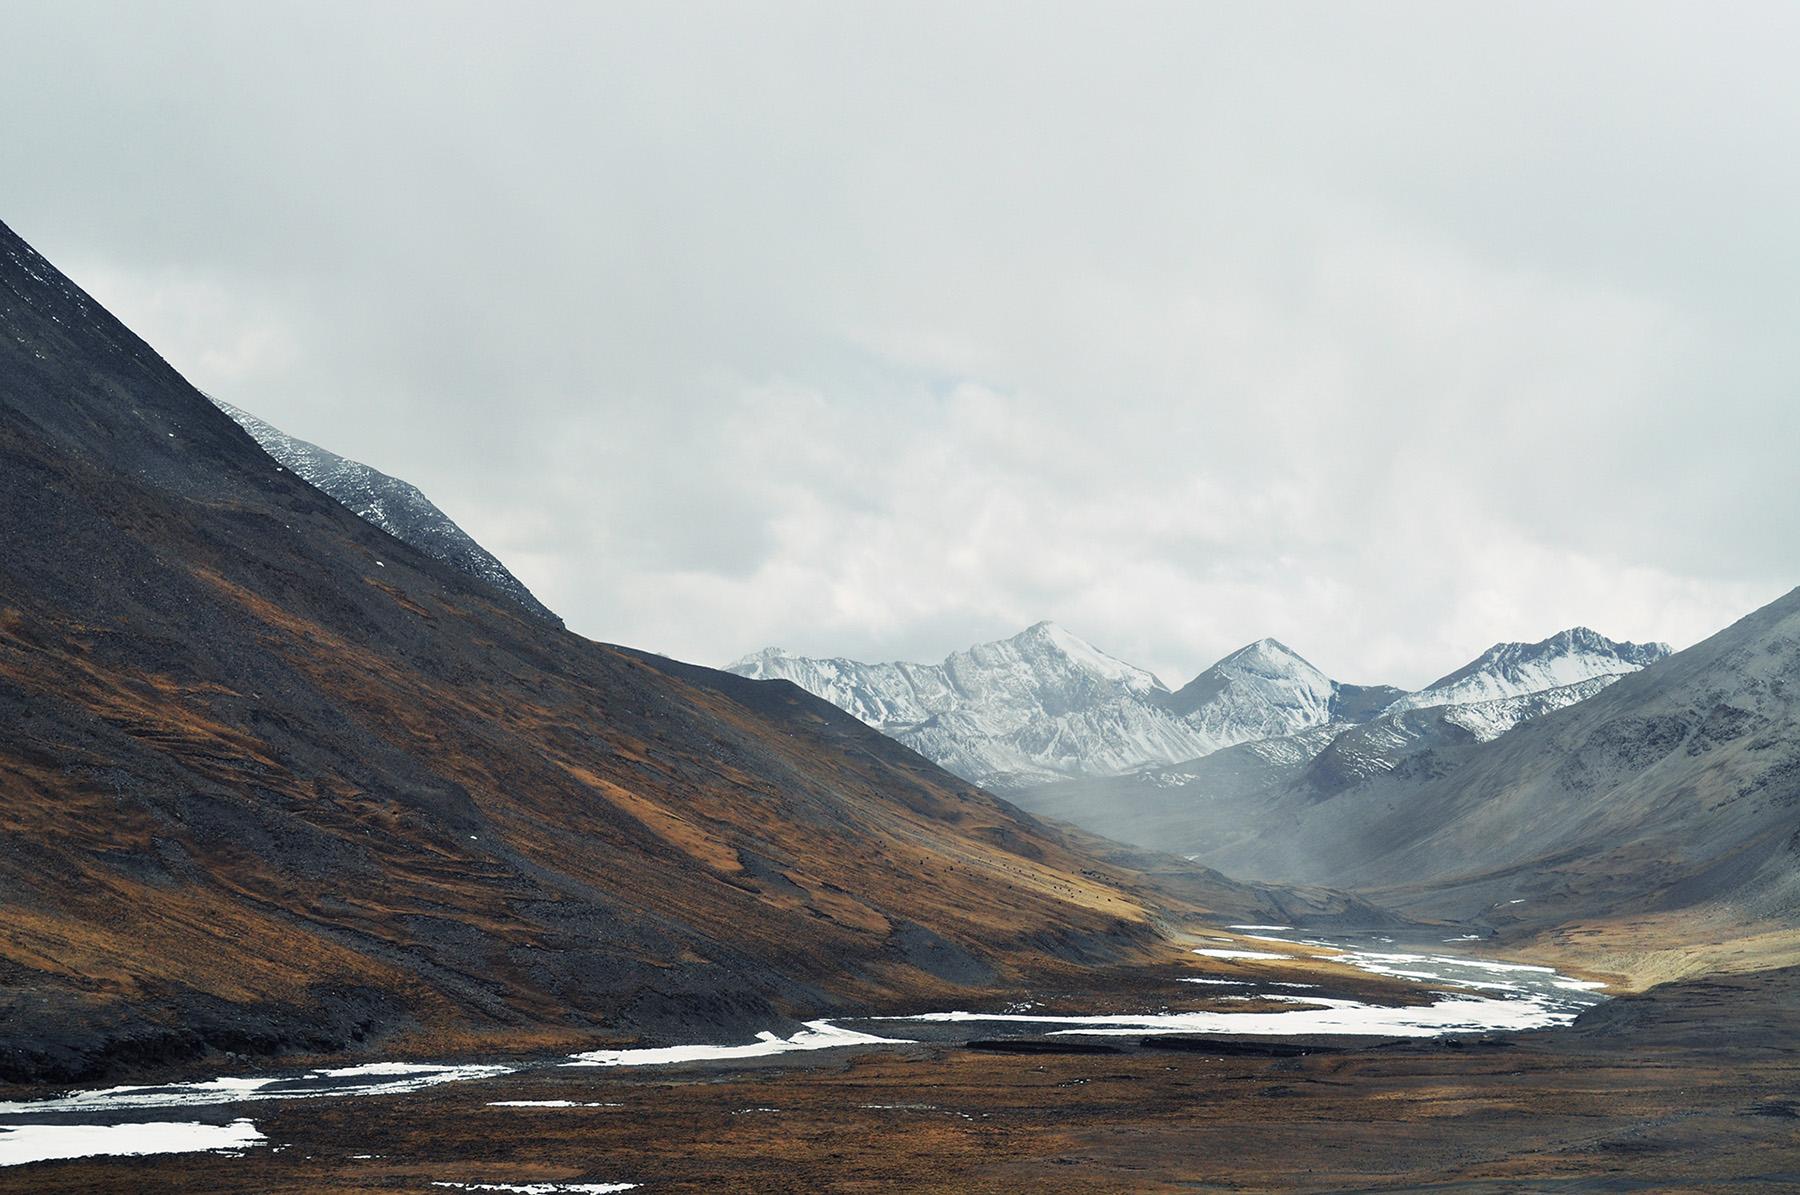 View from Kharola, Tibet